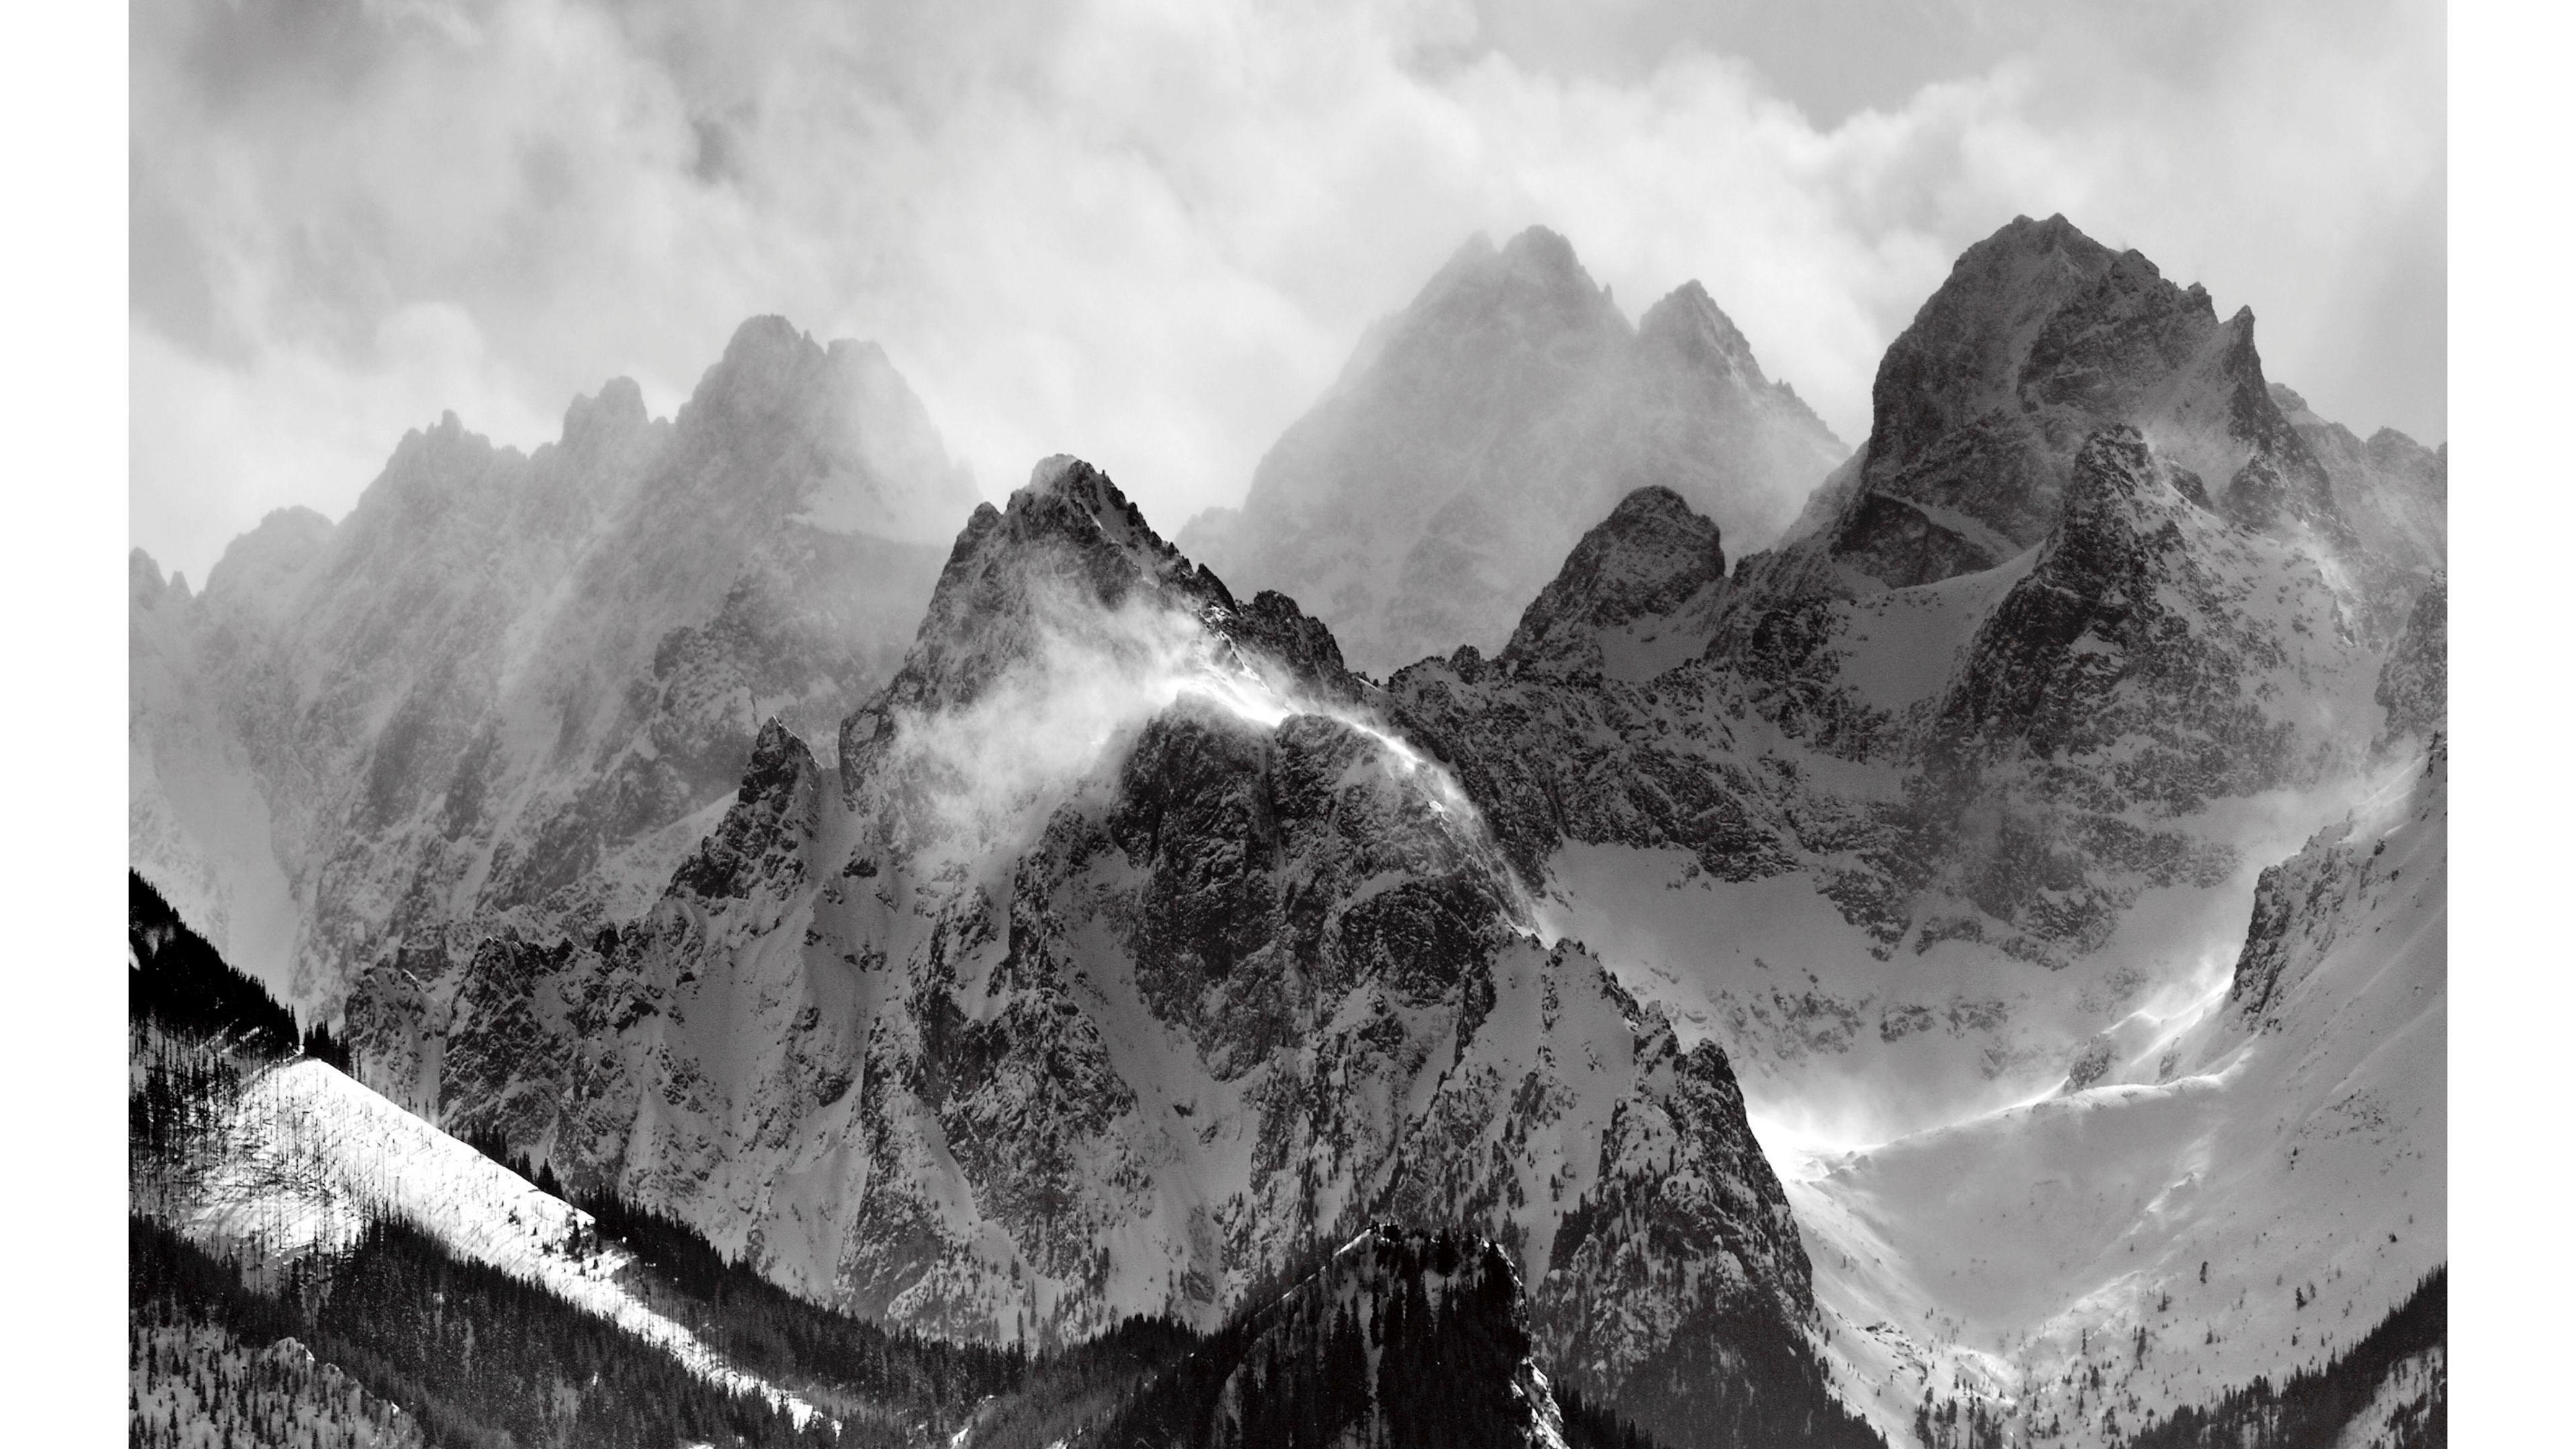 Black and White 4K Mountains Wallpaper